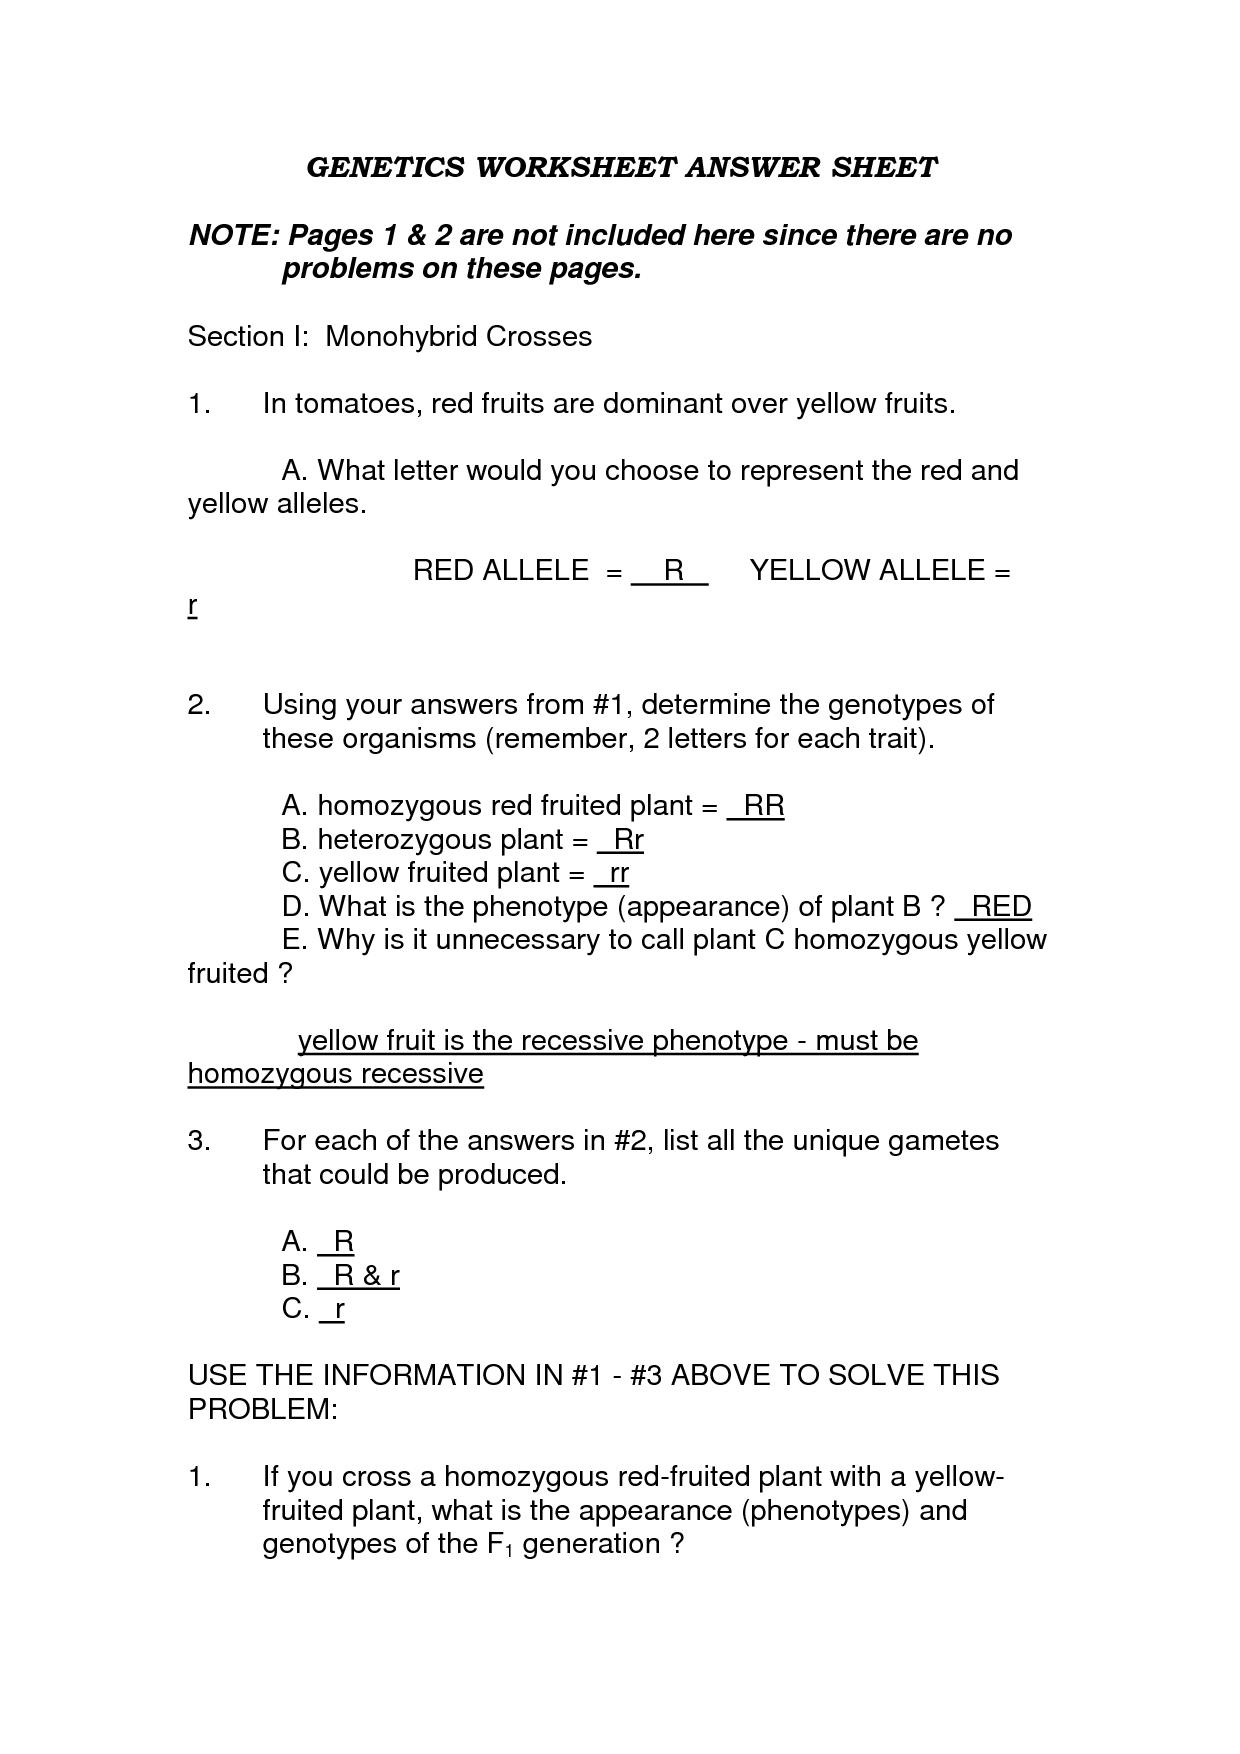 Monohybrid Crosses Worksheet Answers